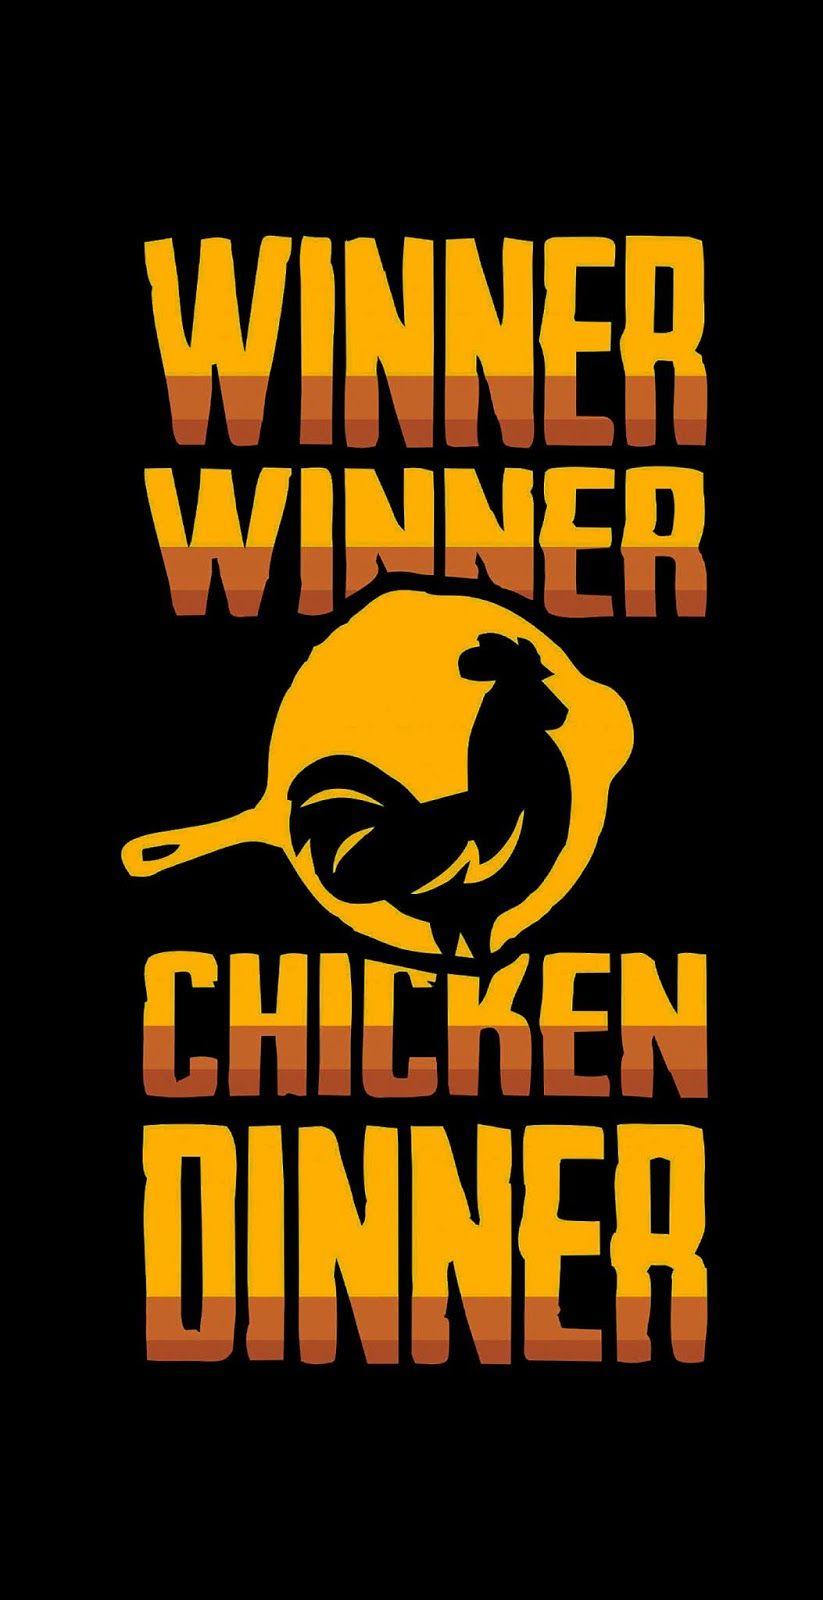 Winner Winner Chicken Dinner In 2021 Winner Winner Chicken Dinner Hd Wallpapers For Mobile Mobile Wallpaper